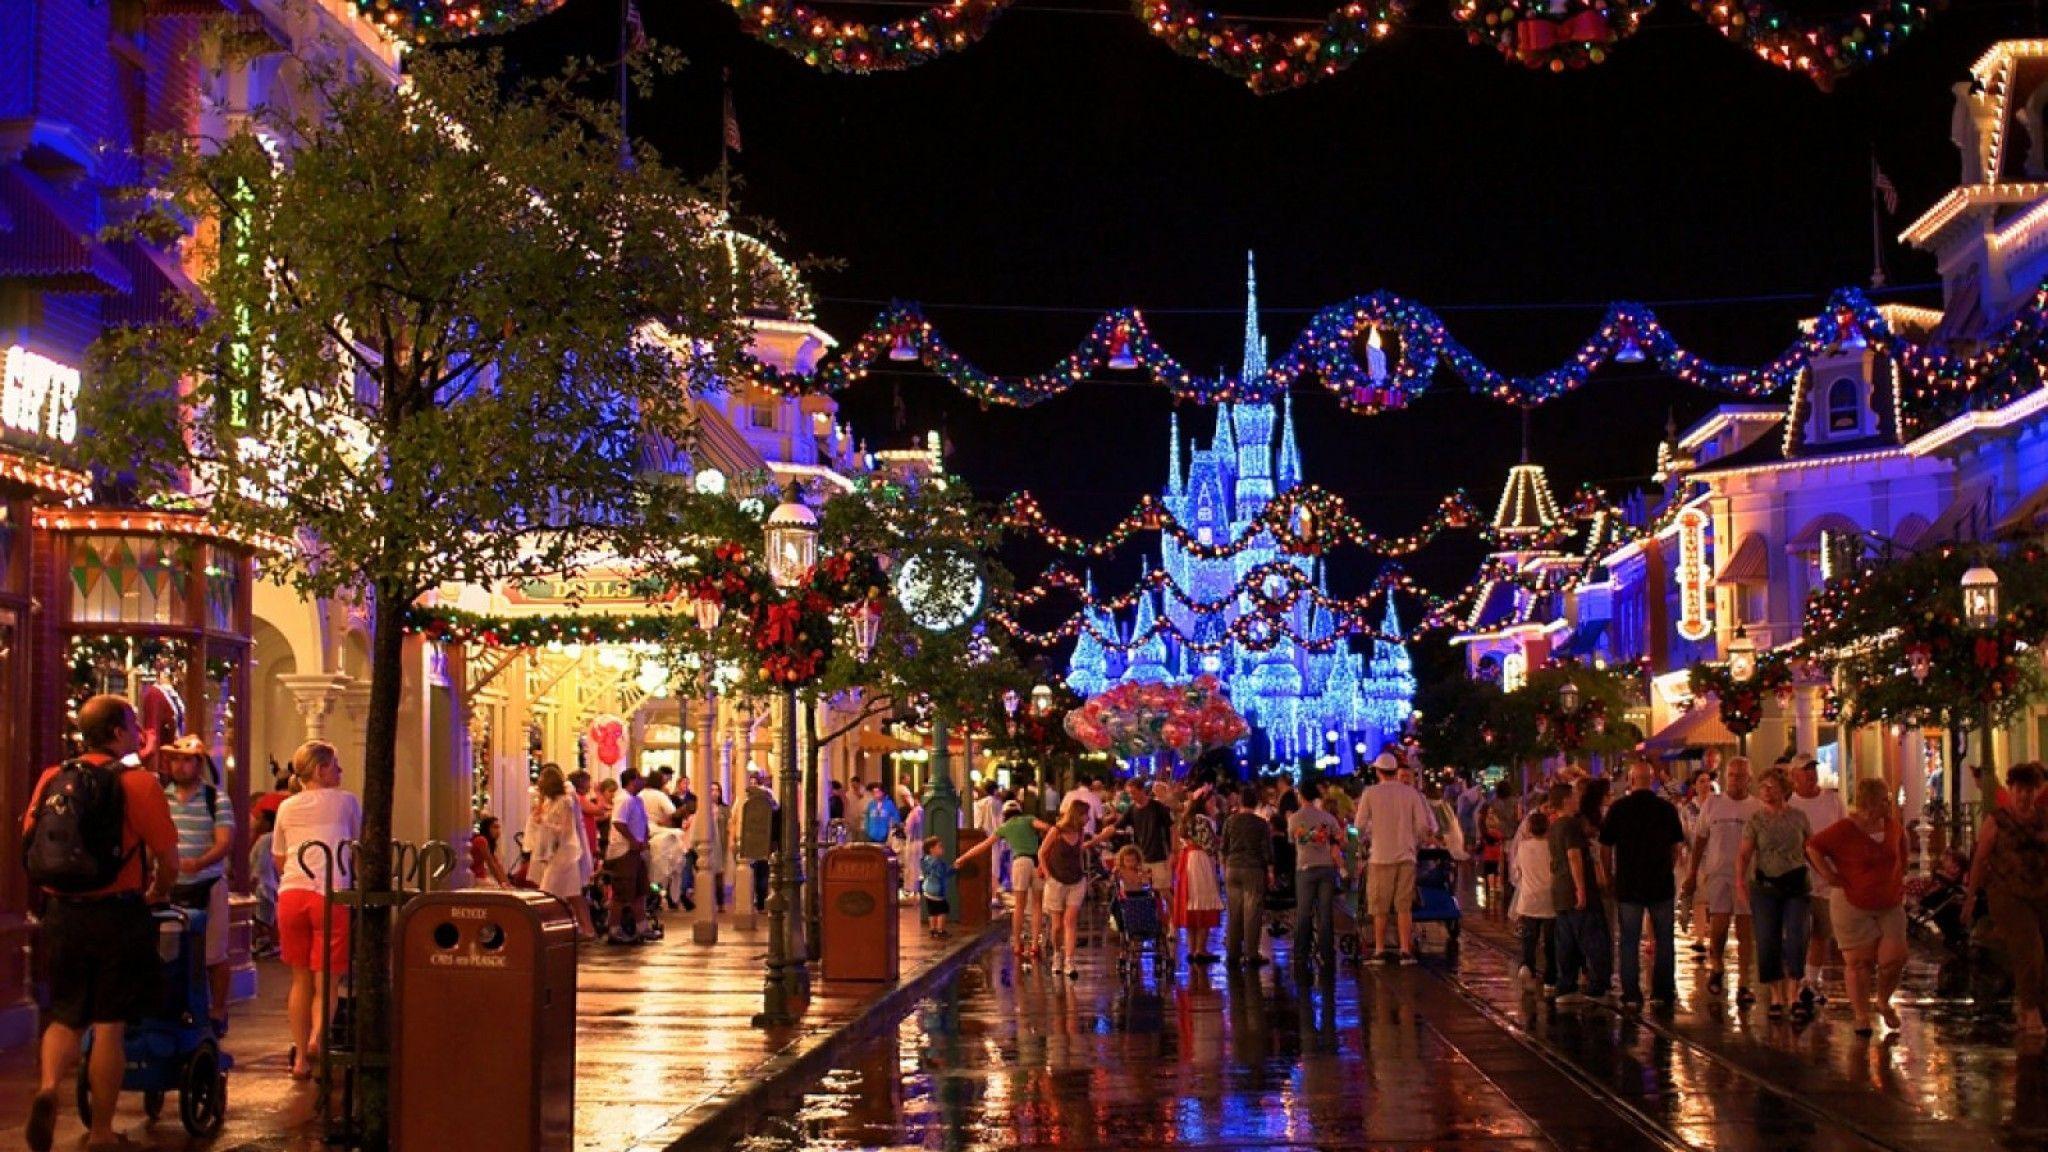 Disney World Christmas Wallpapers Top Free Disney World Christmas Backgrounds Wallpaperaccess